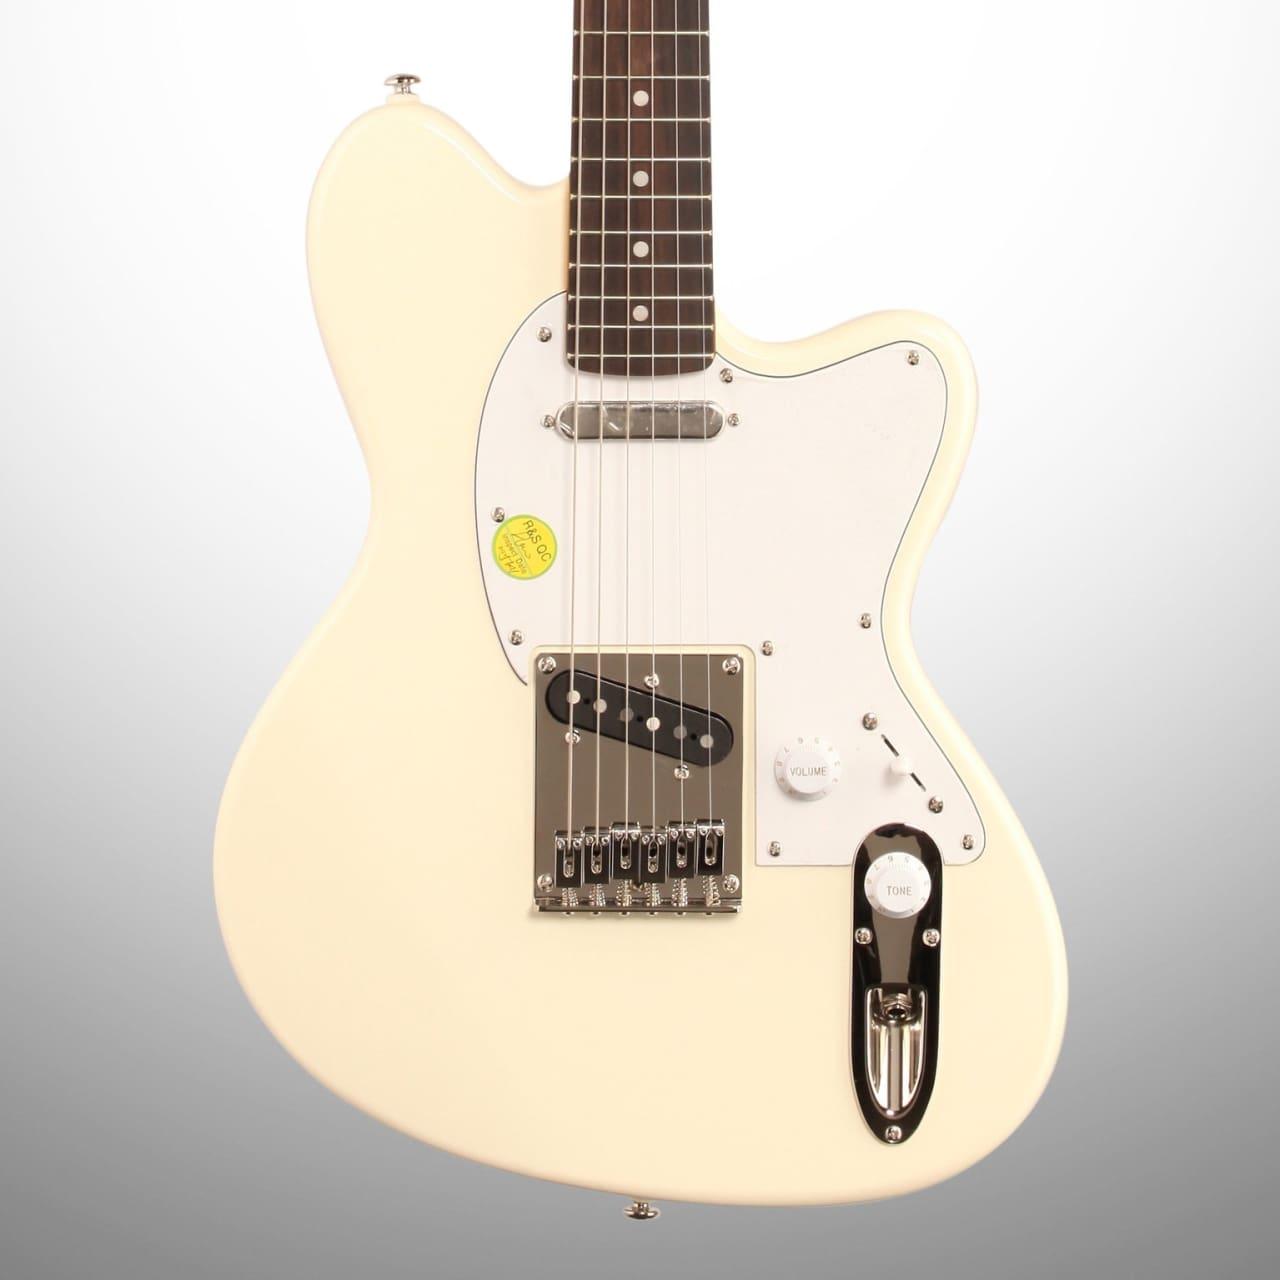 ibanez talman tm302 electric guitar ivory open box reverb. Black Bedroom Furniture Sets. Home Design Ideas